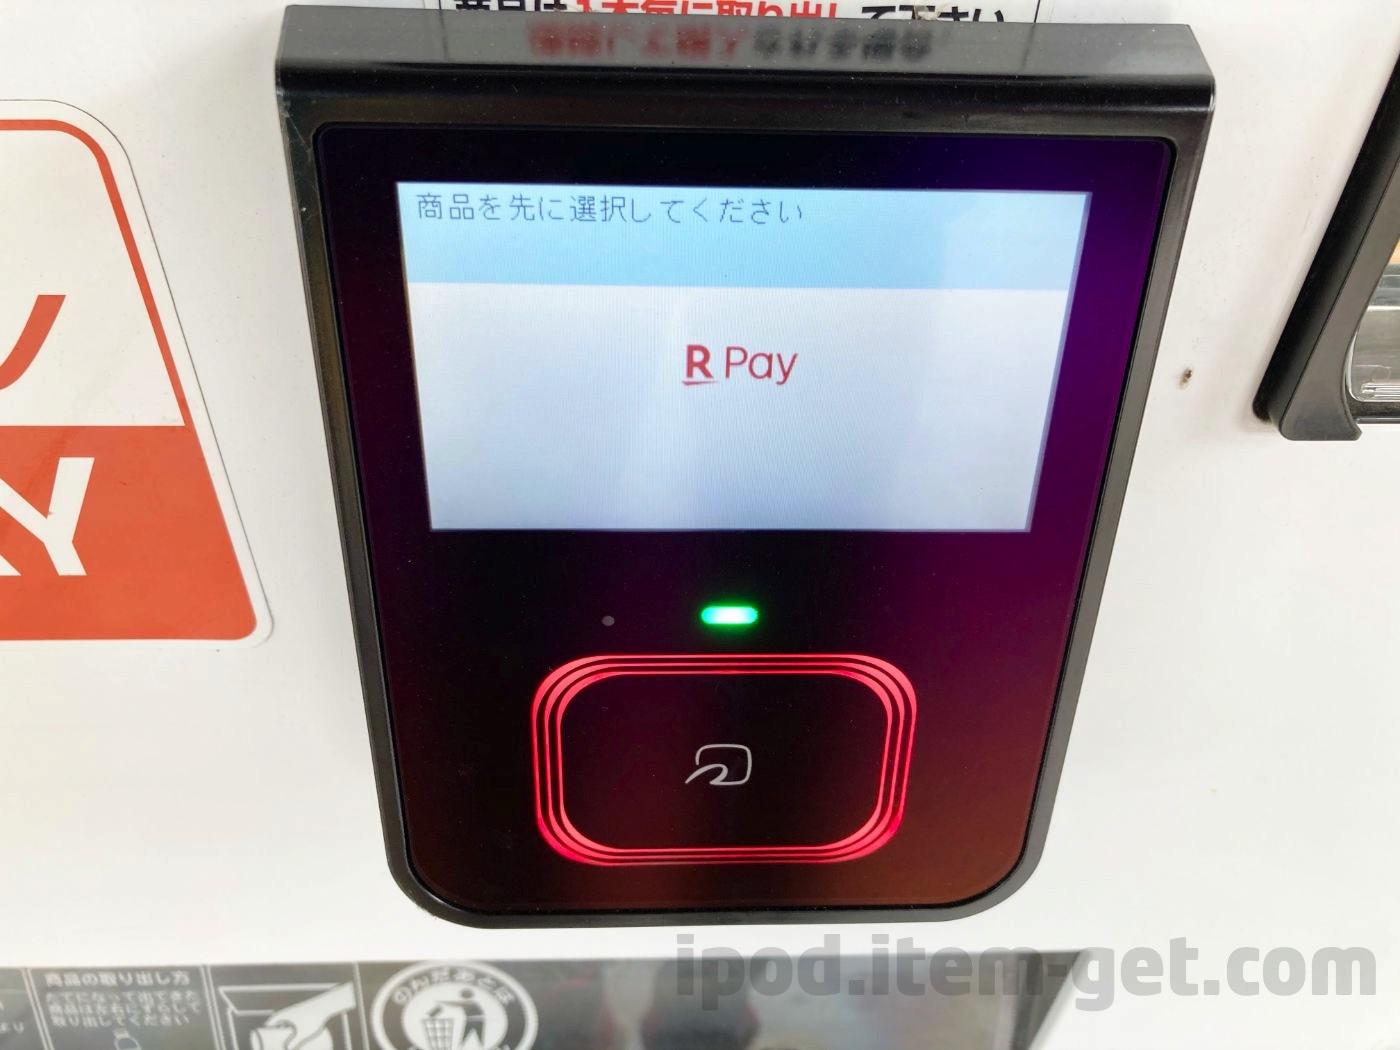 QRcode jihanki vendingmachine 05